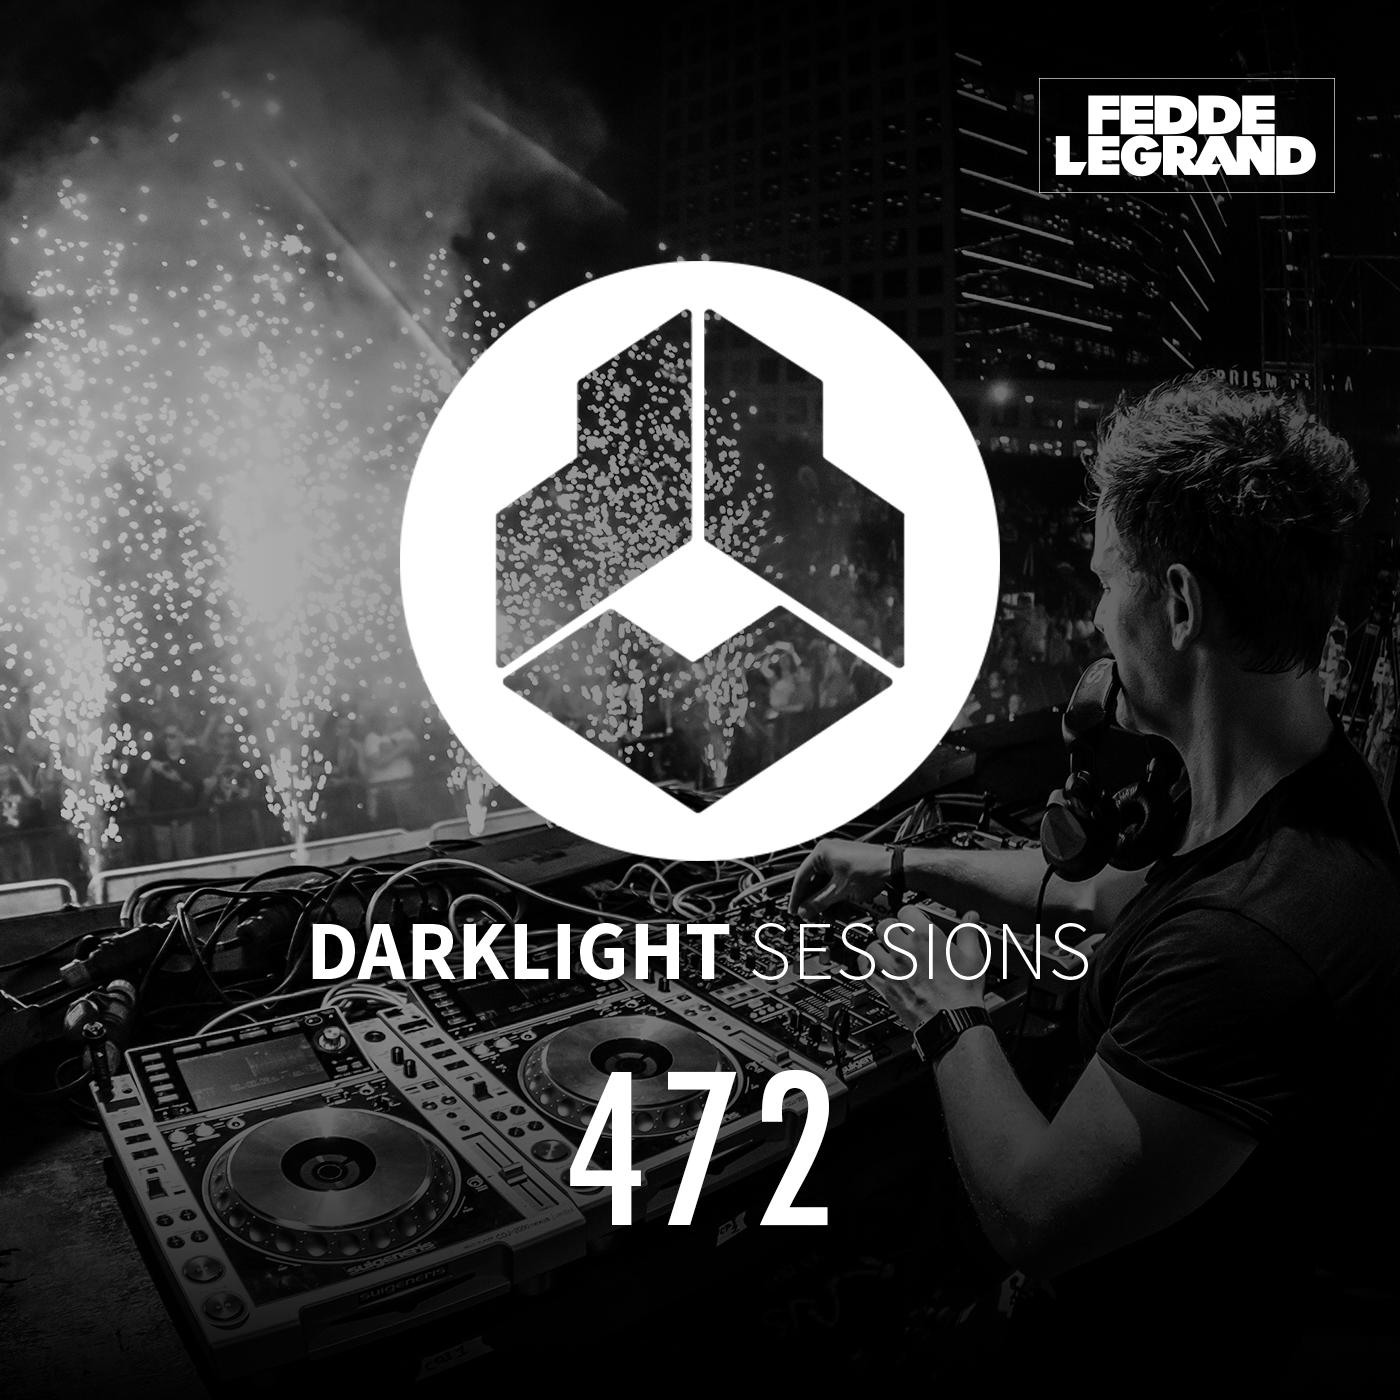 Darklight Sessions 472